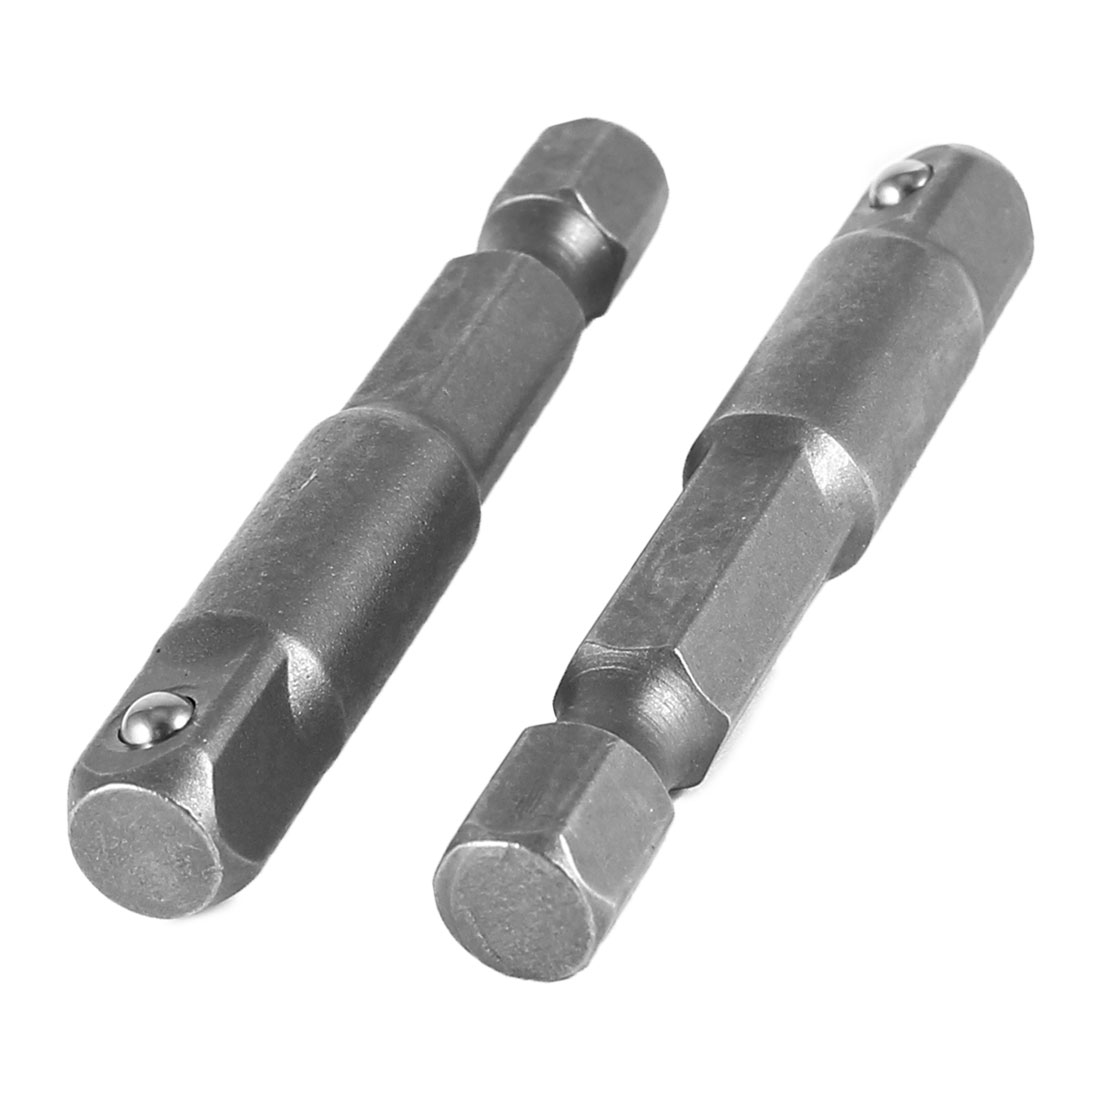 "2 Pcs Impact Driver/Drill 1/4"" Hex Hexagon Shank to 1/4"" Socket Adapter Set"